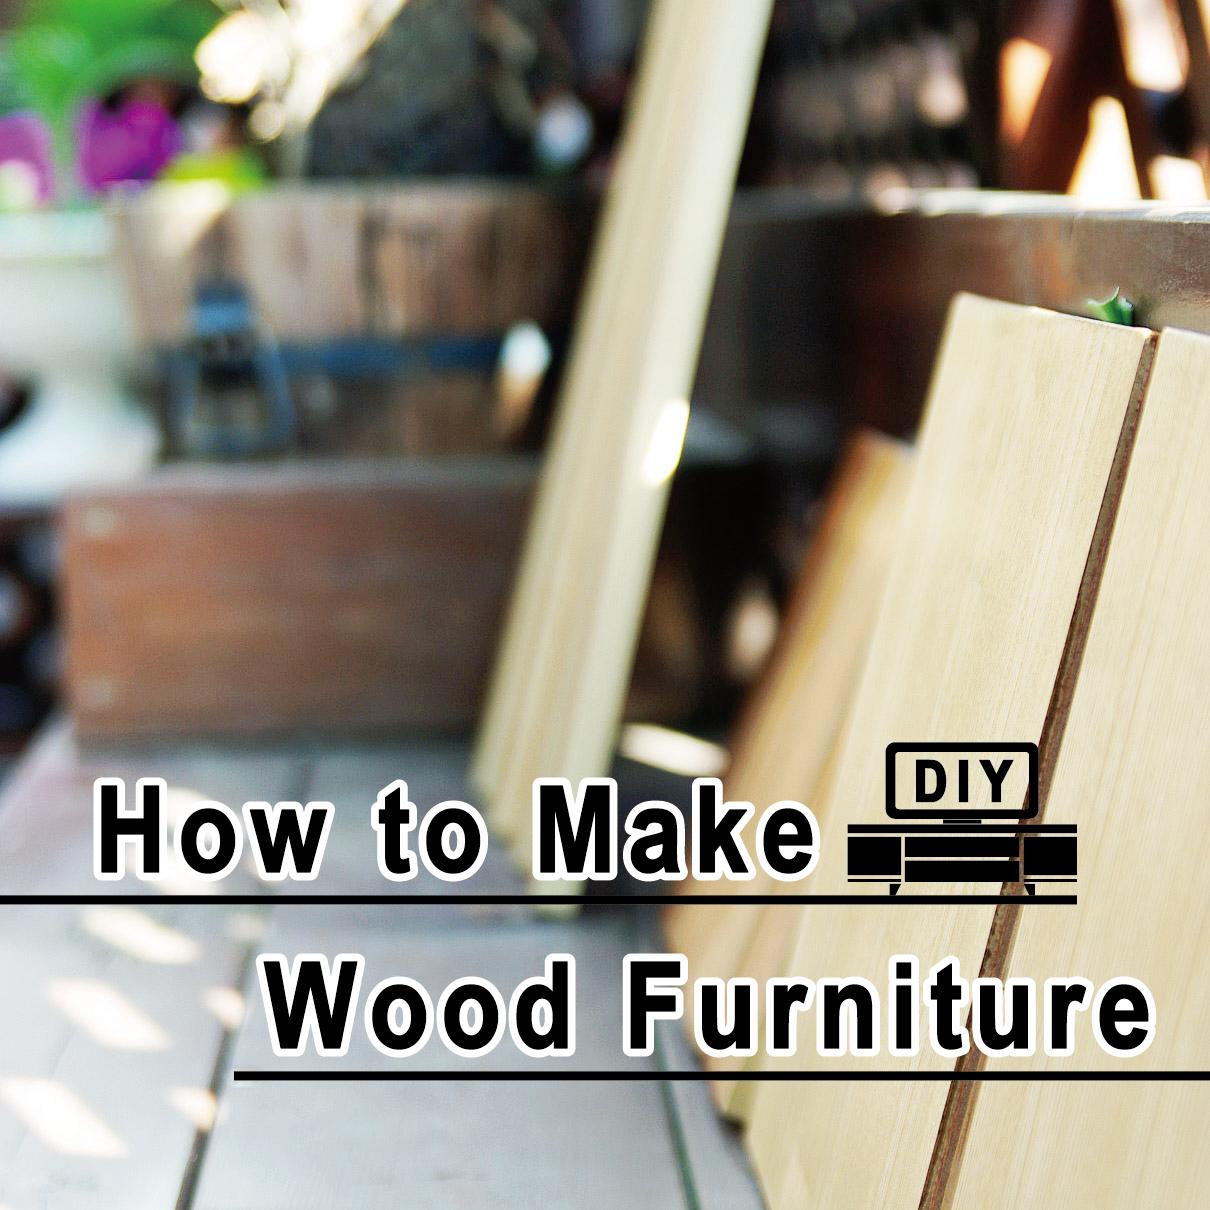 How to Make Wood Furniture